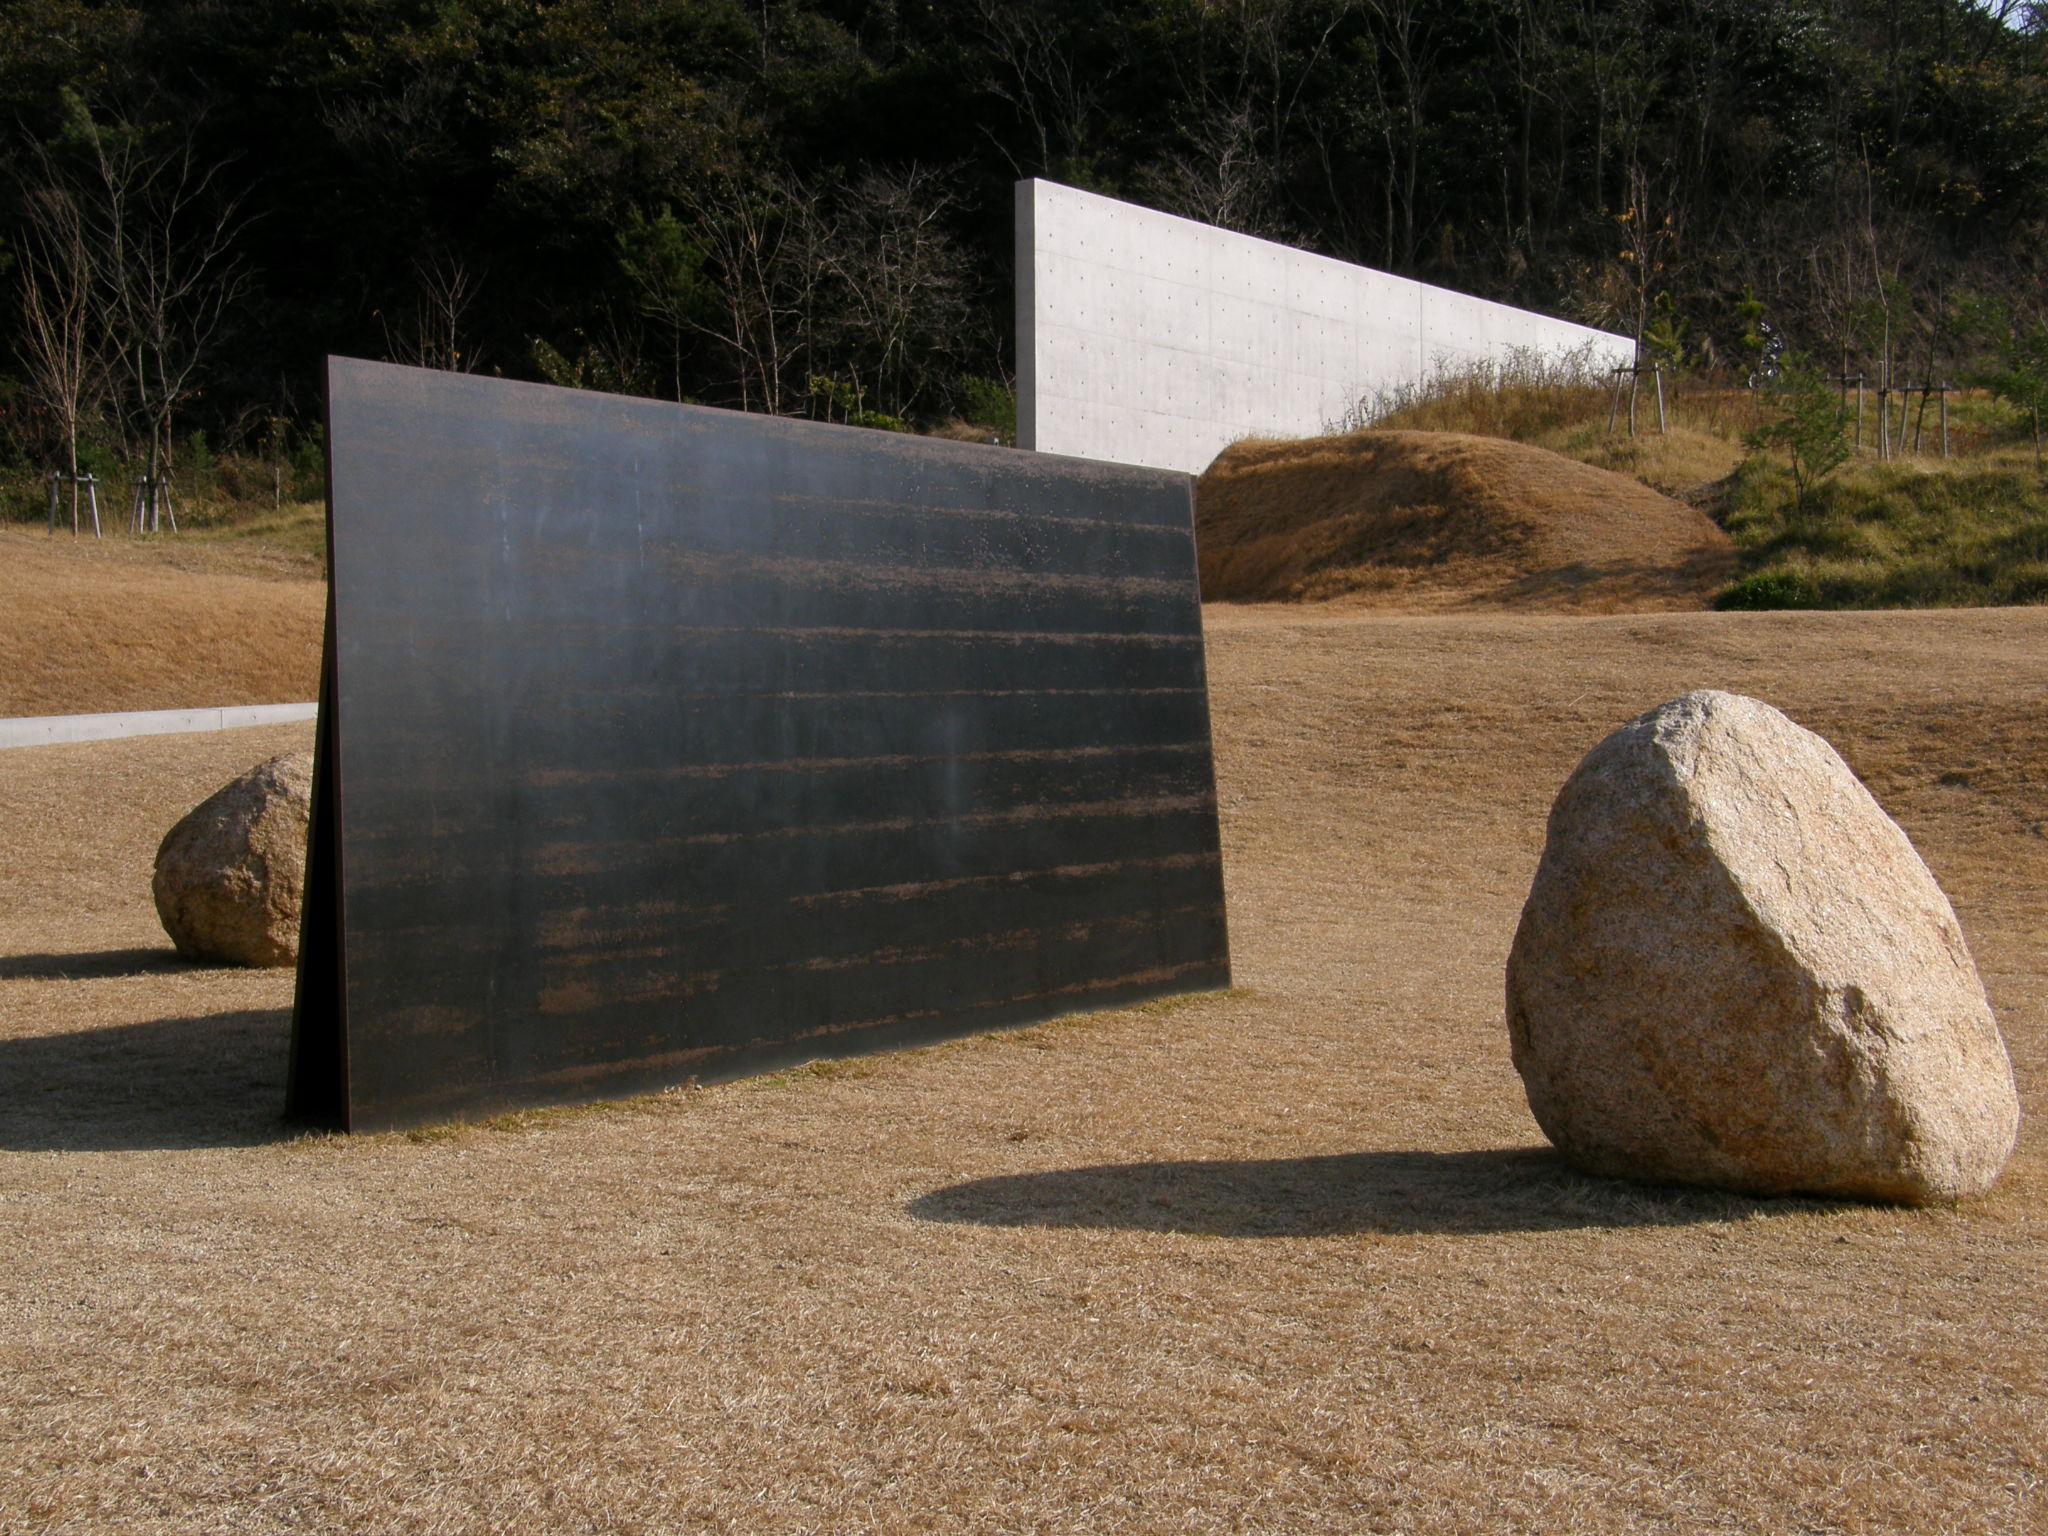 Art contemporain jardin japonais le blog - Sculptuur jardin contemporain ...